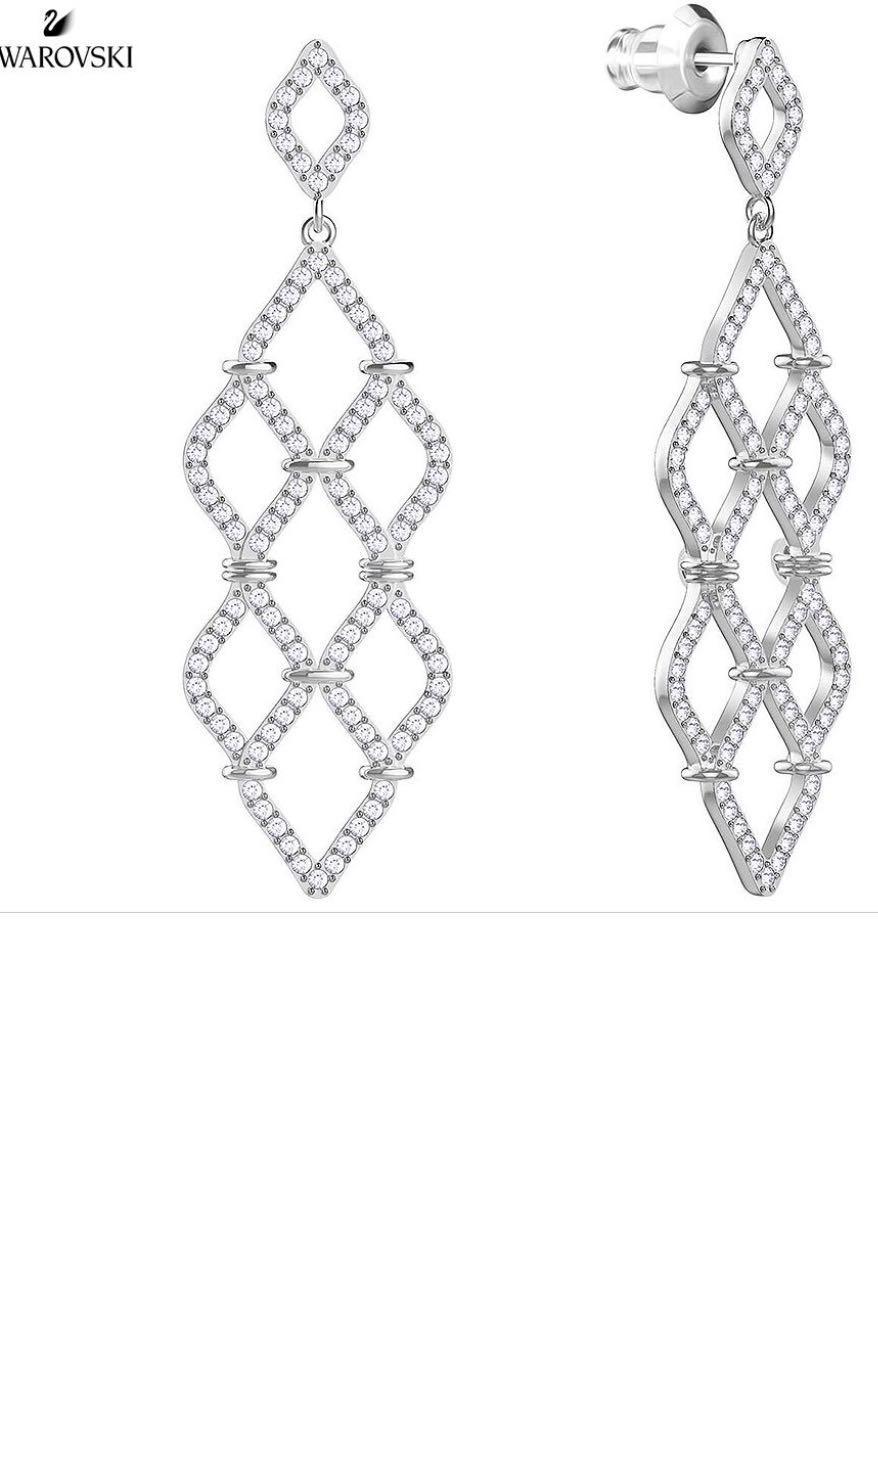 New authentic Swarovski crystal chandelier earrings